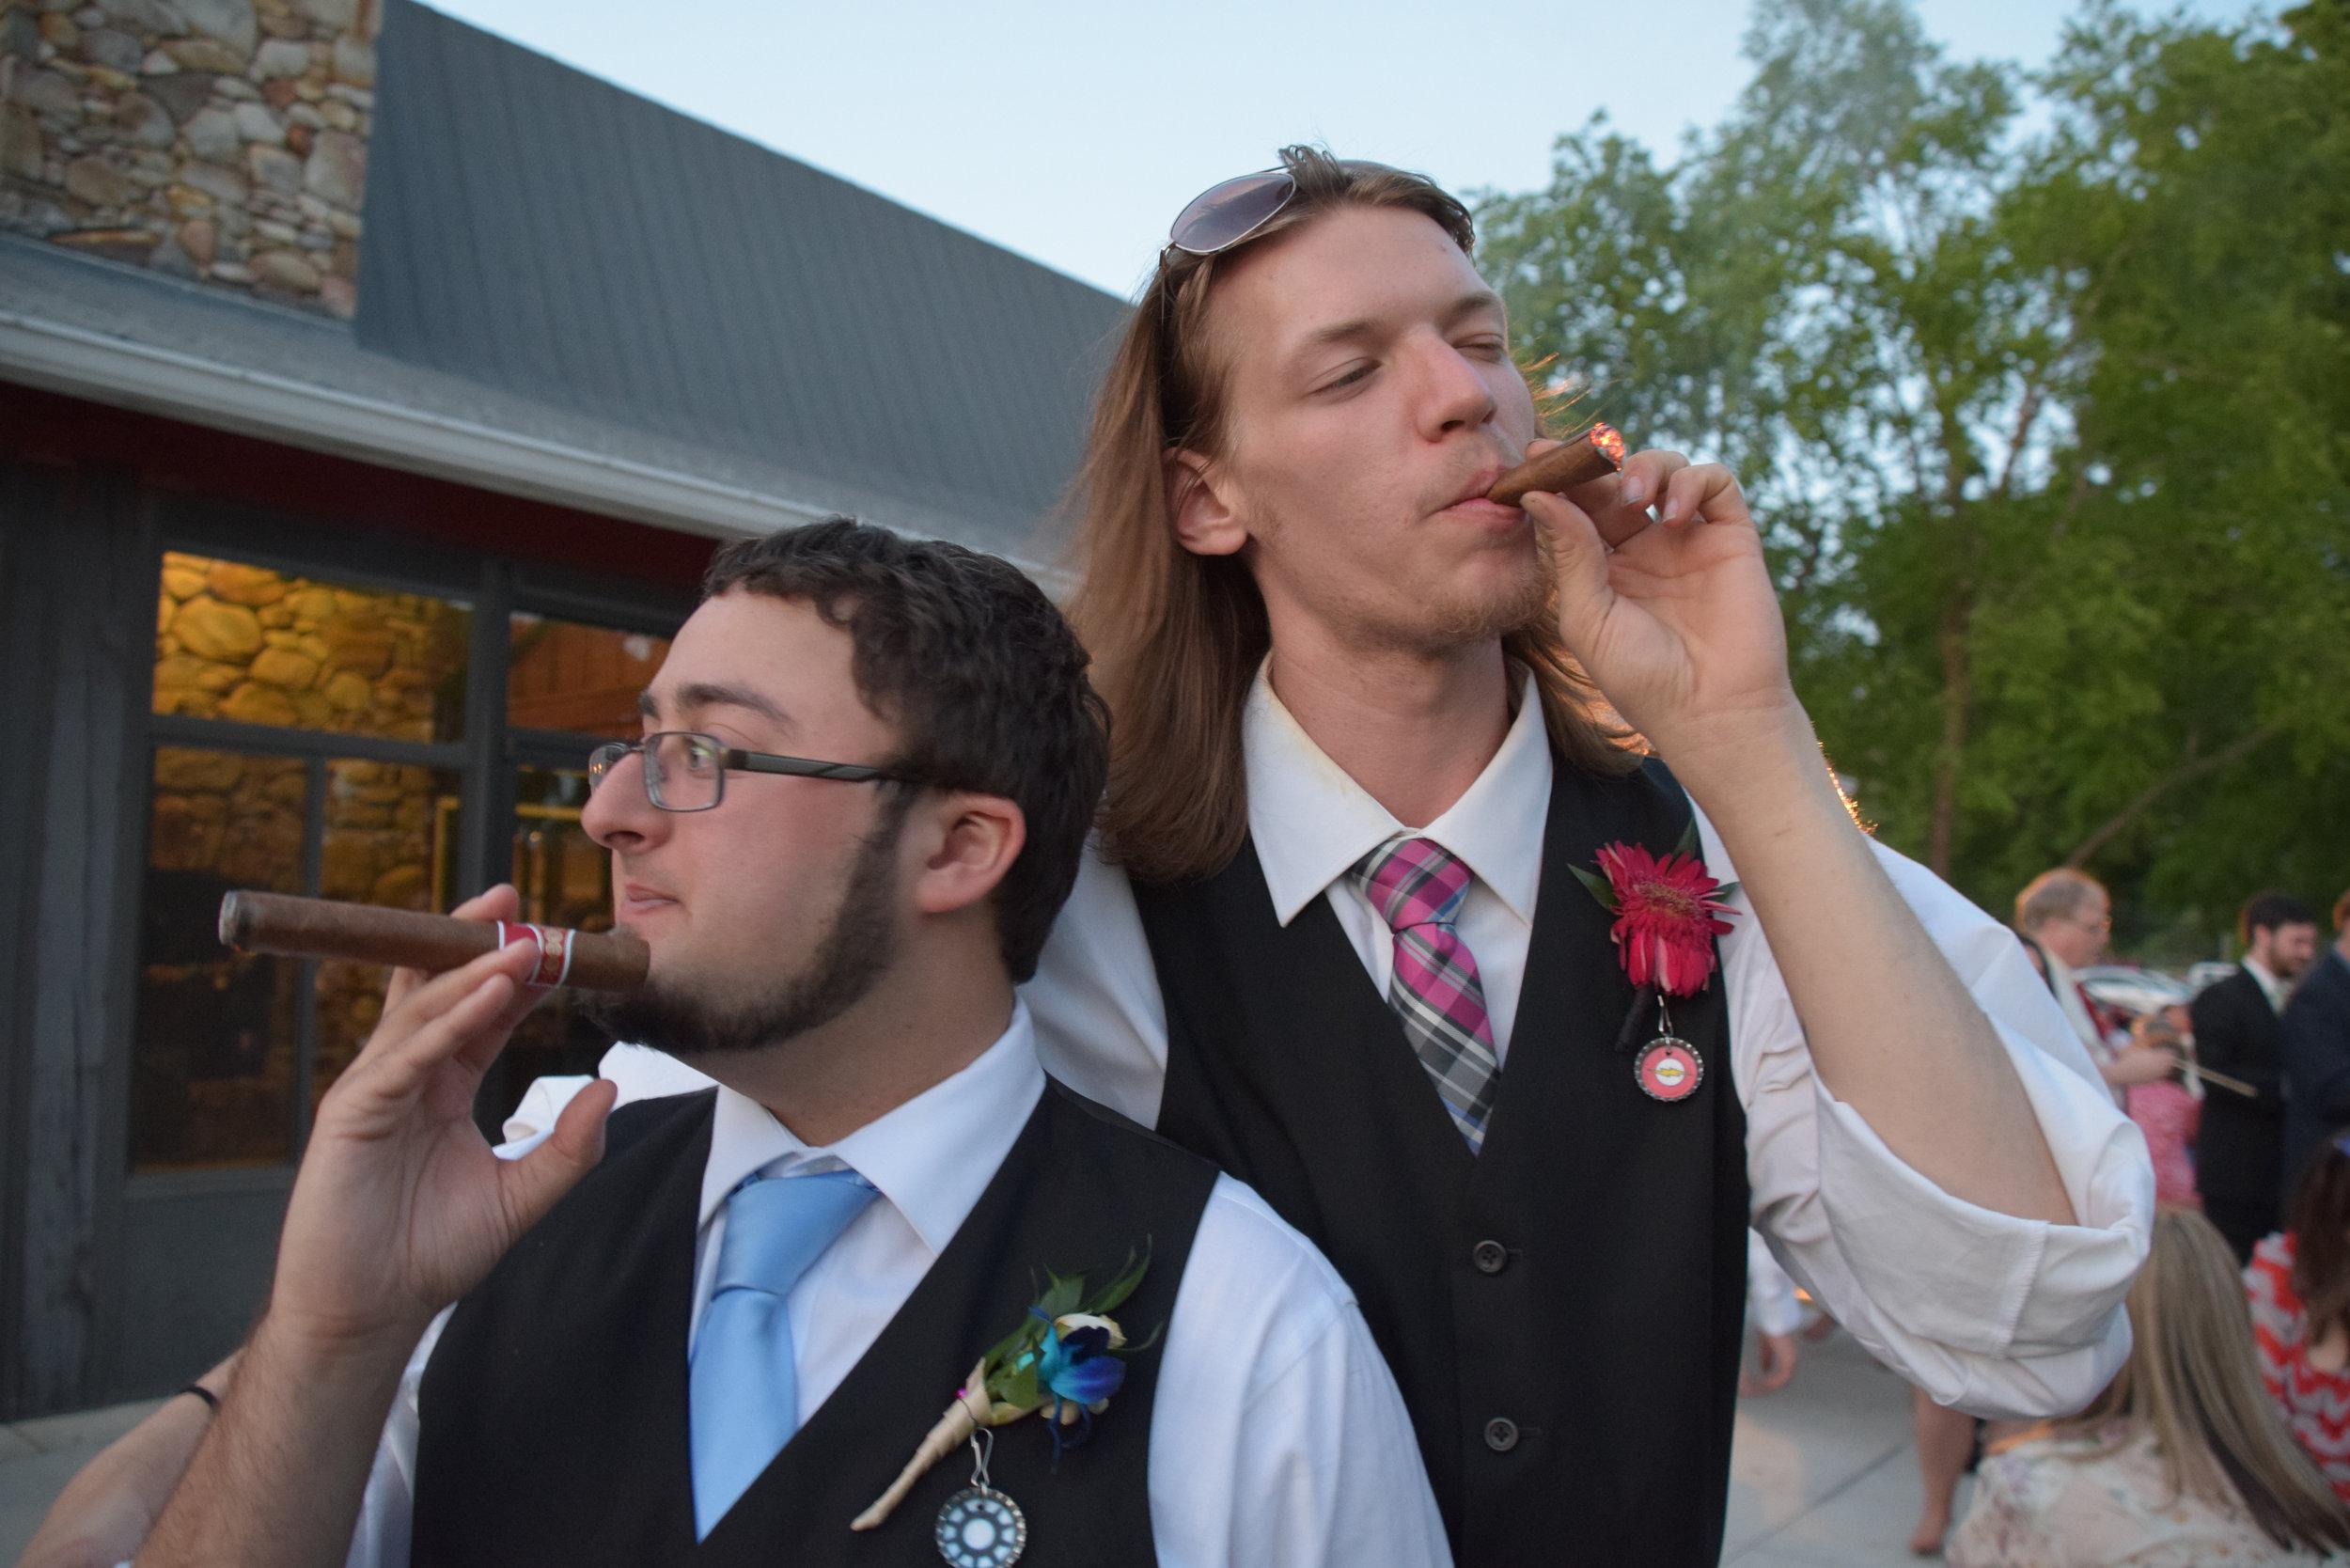 Cigars.